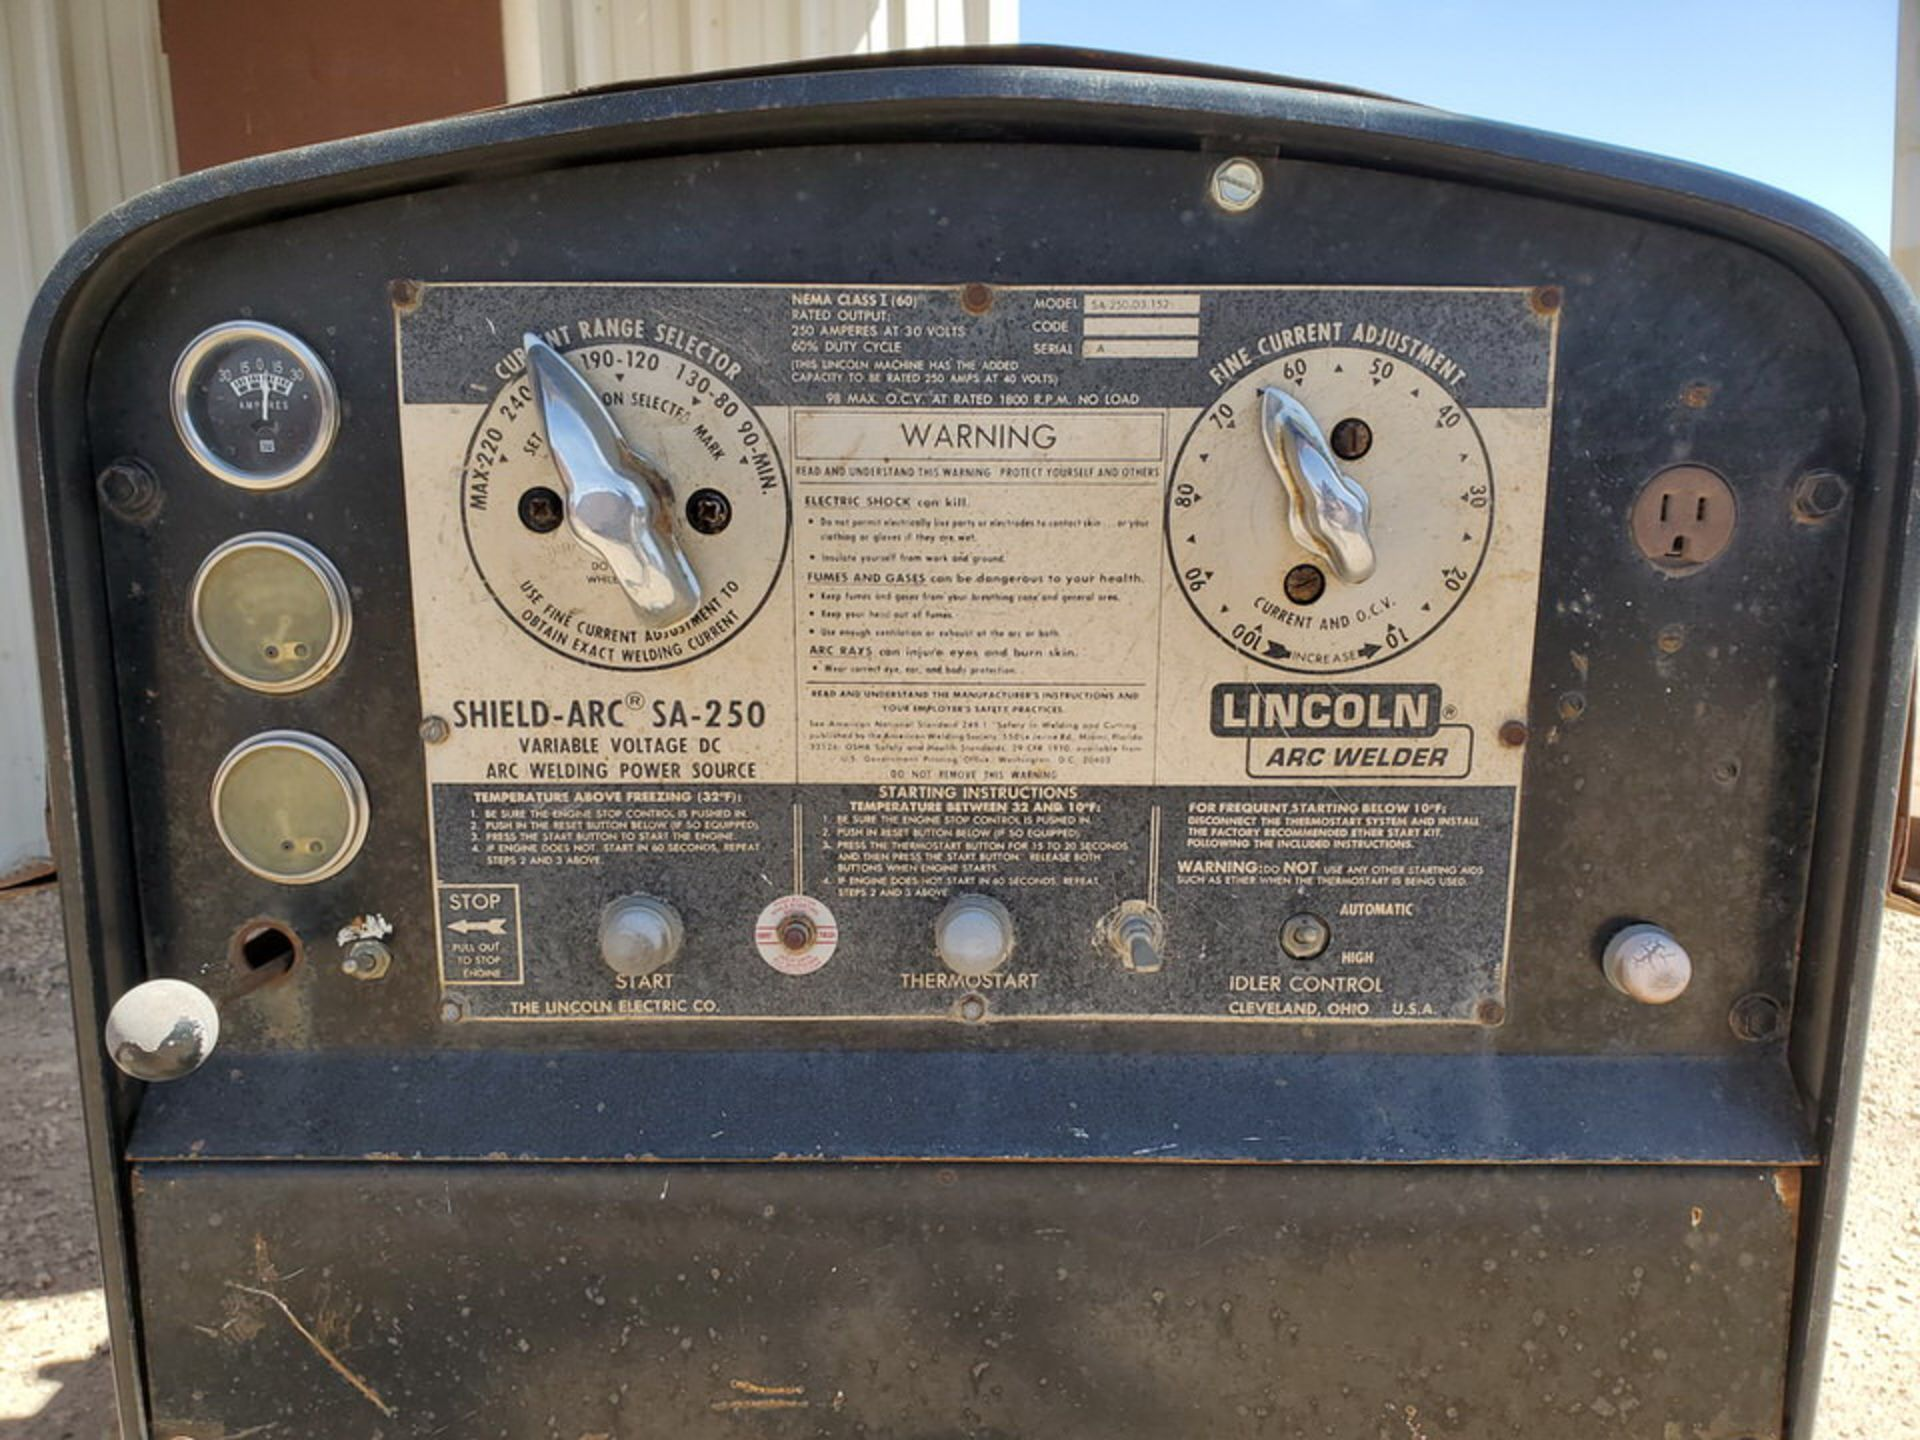 Lincoln Sa-250D3.152 Arc Welder - Image 7 of 11